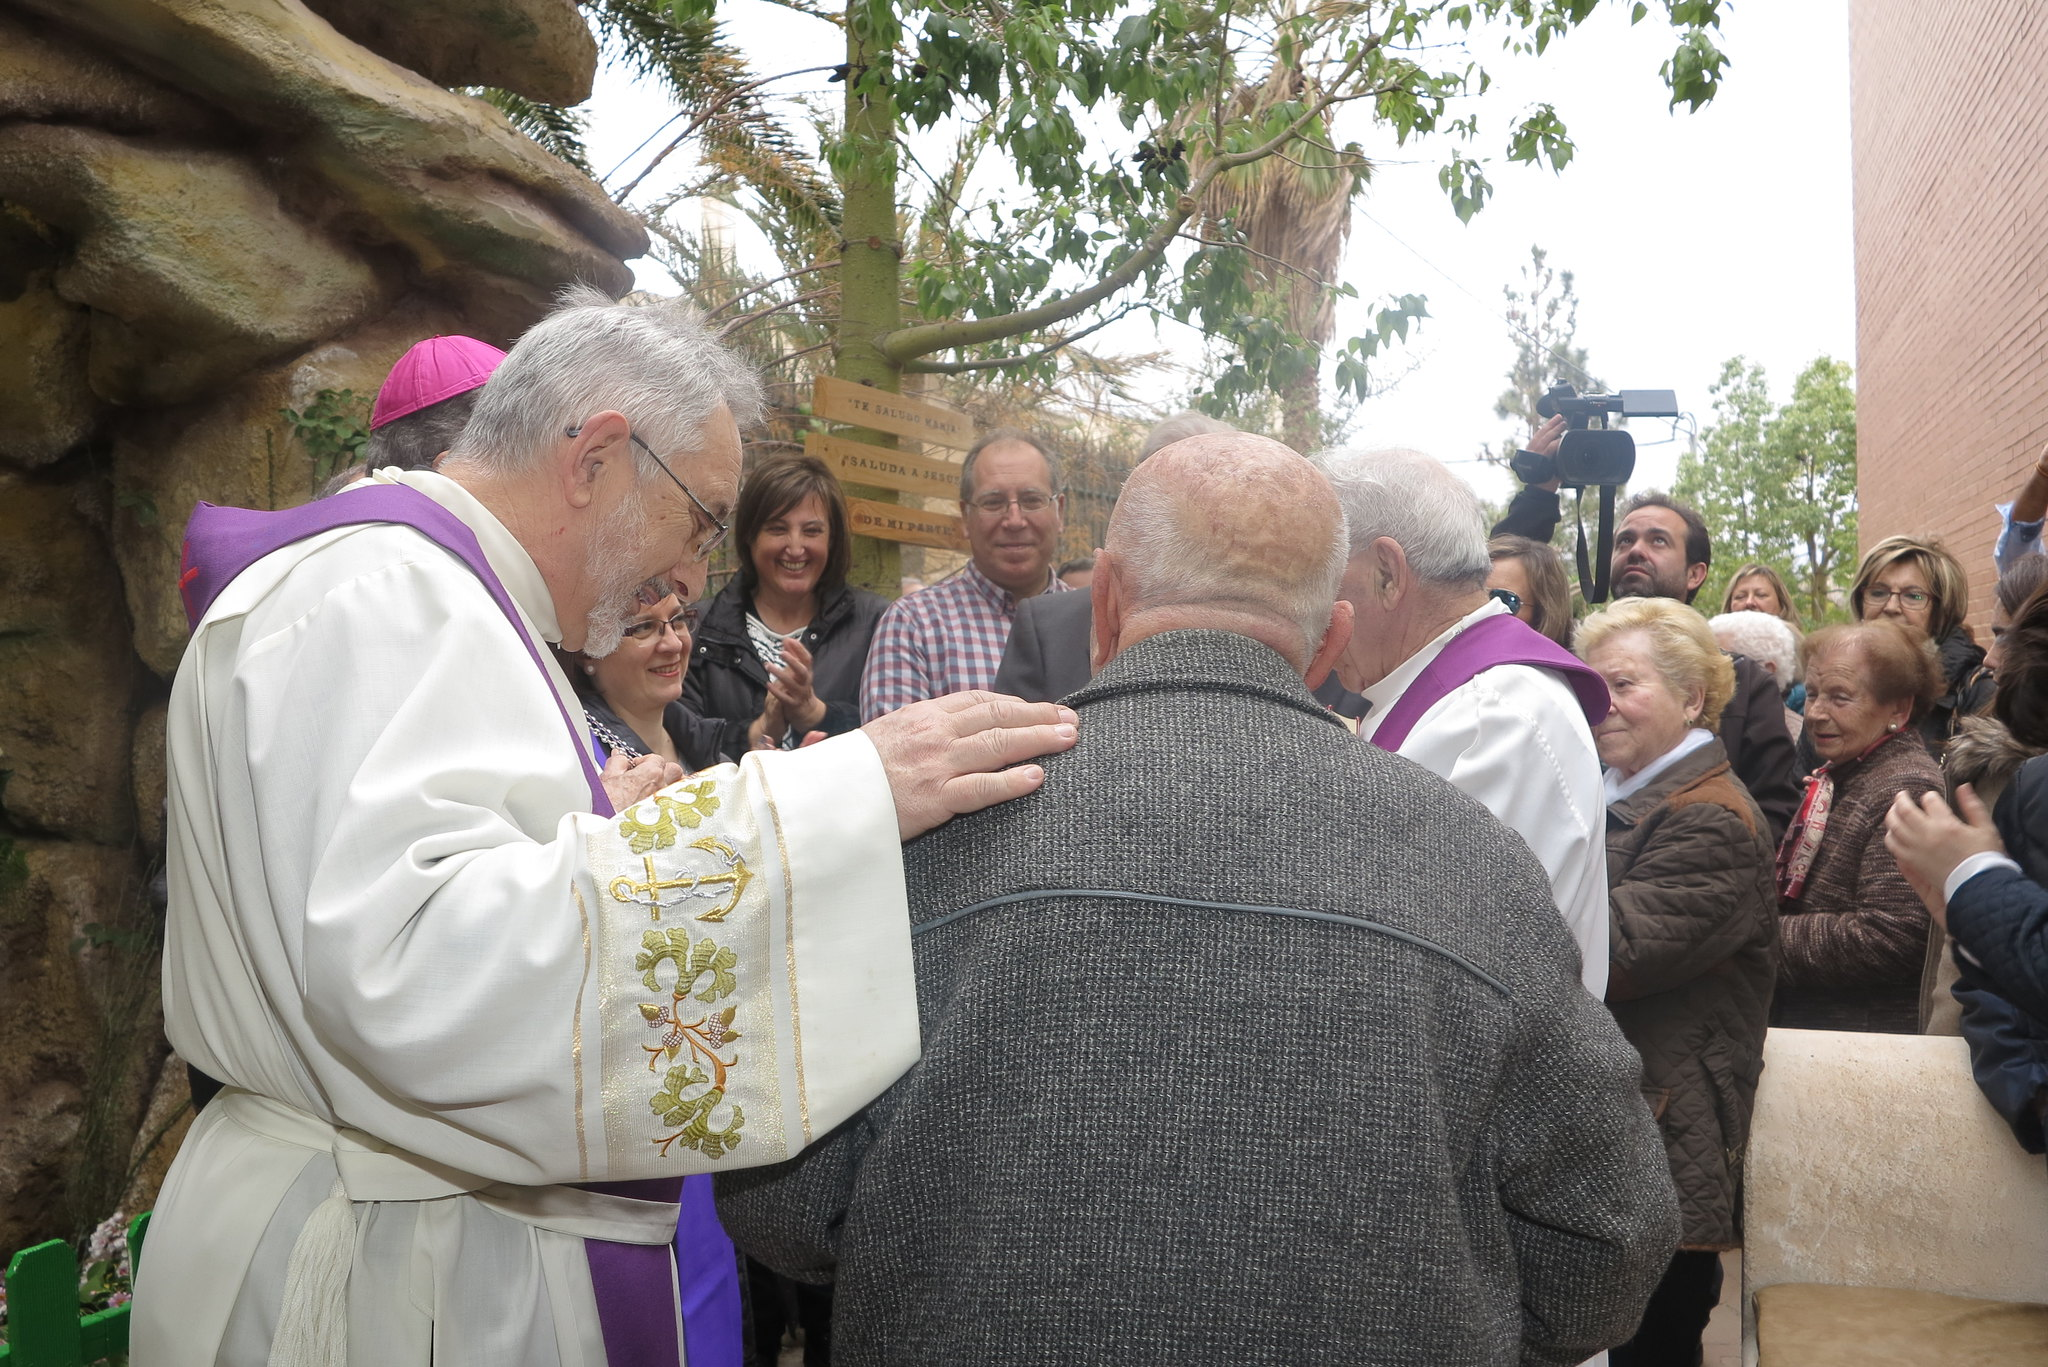 (2016-02-13) - Inauguración Virgen de Lourdes, La Molineta - Archivo La Molineta 2 (58)